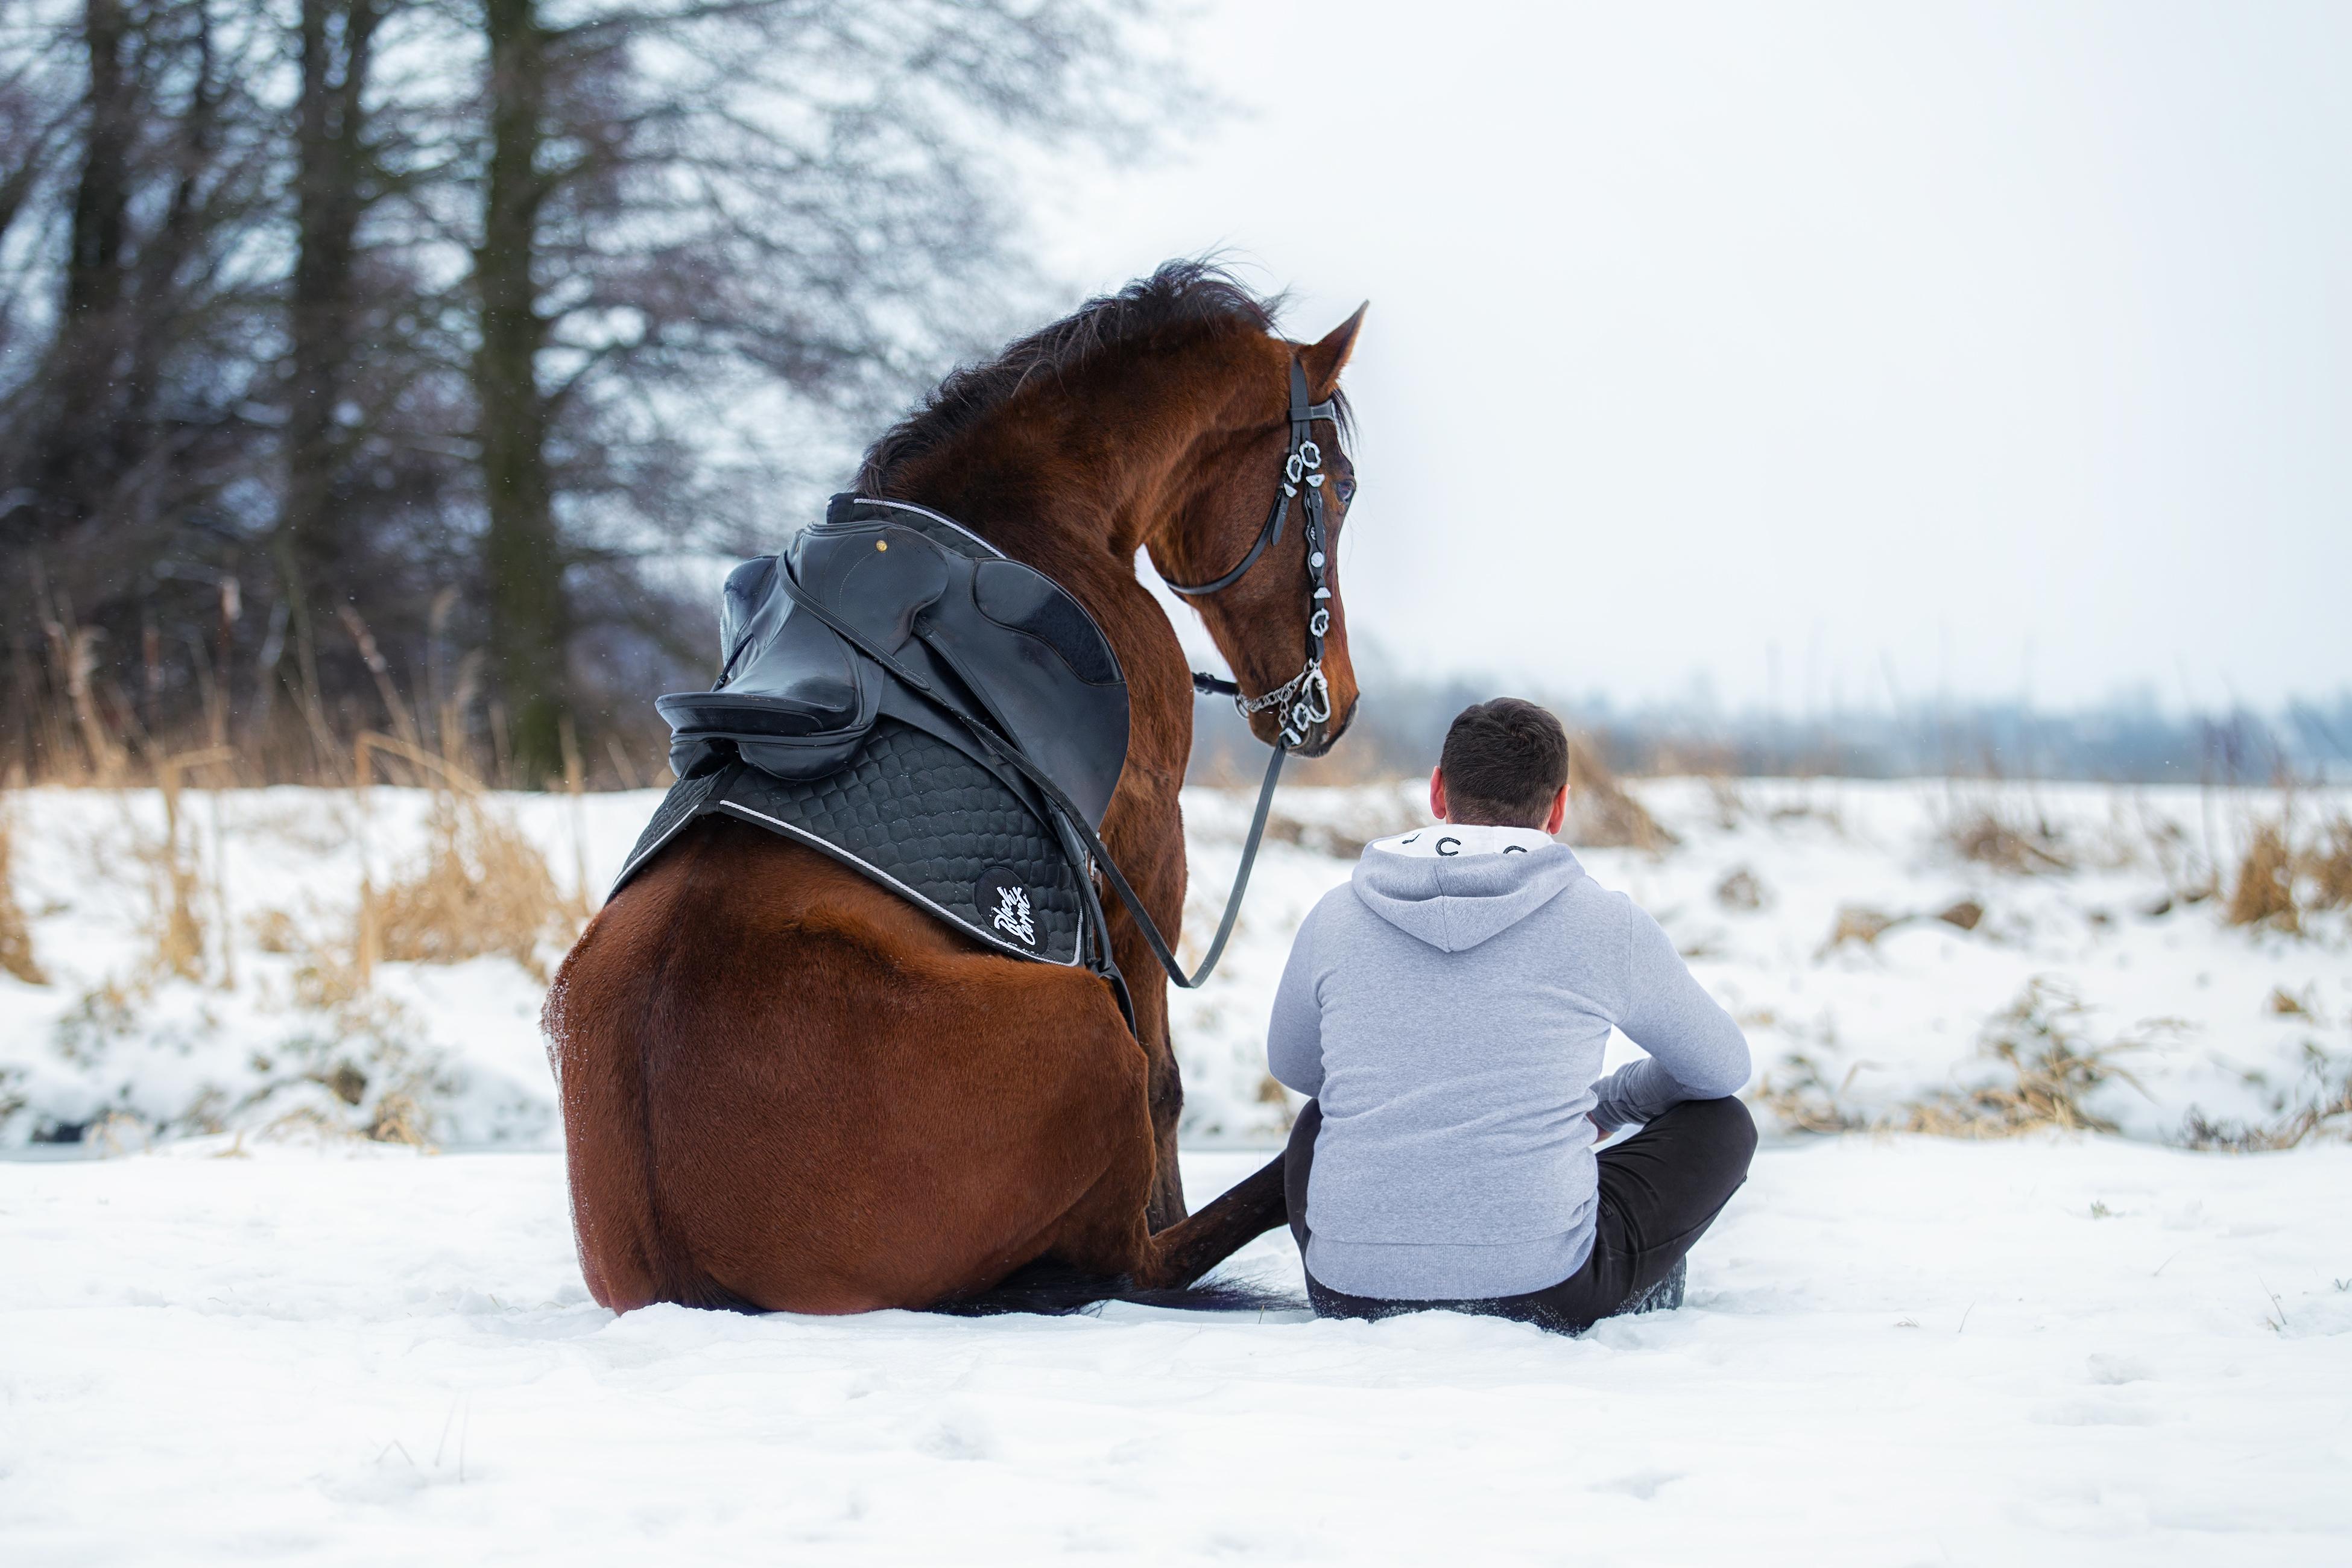 Paweł Jachymek Piotr Dejneka Black Carrot koń horse siedzi sitting